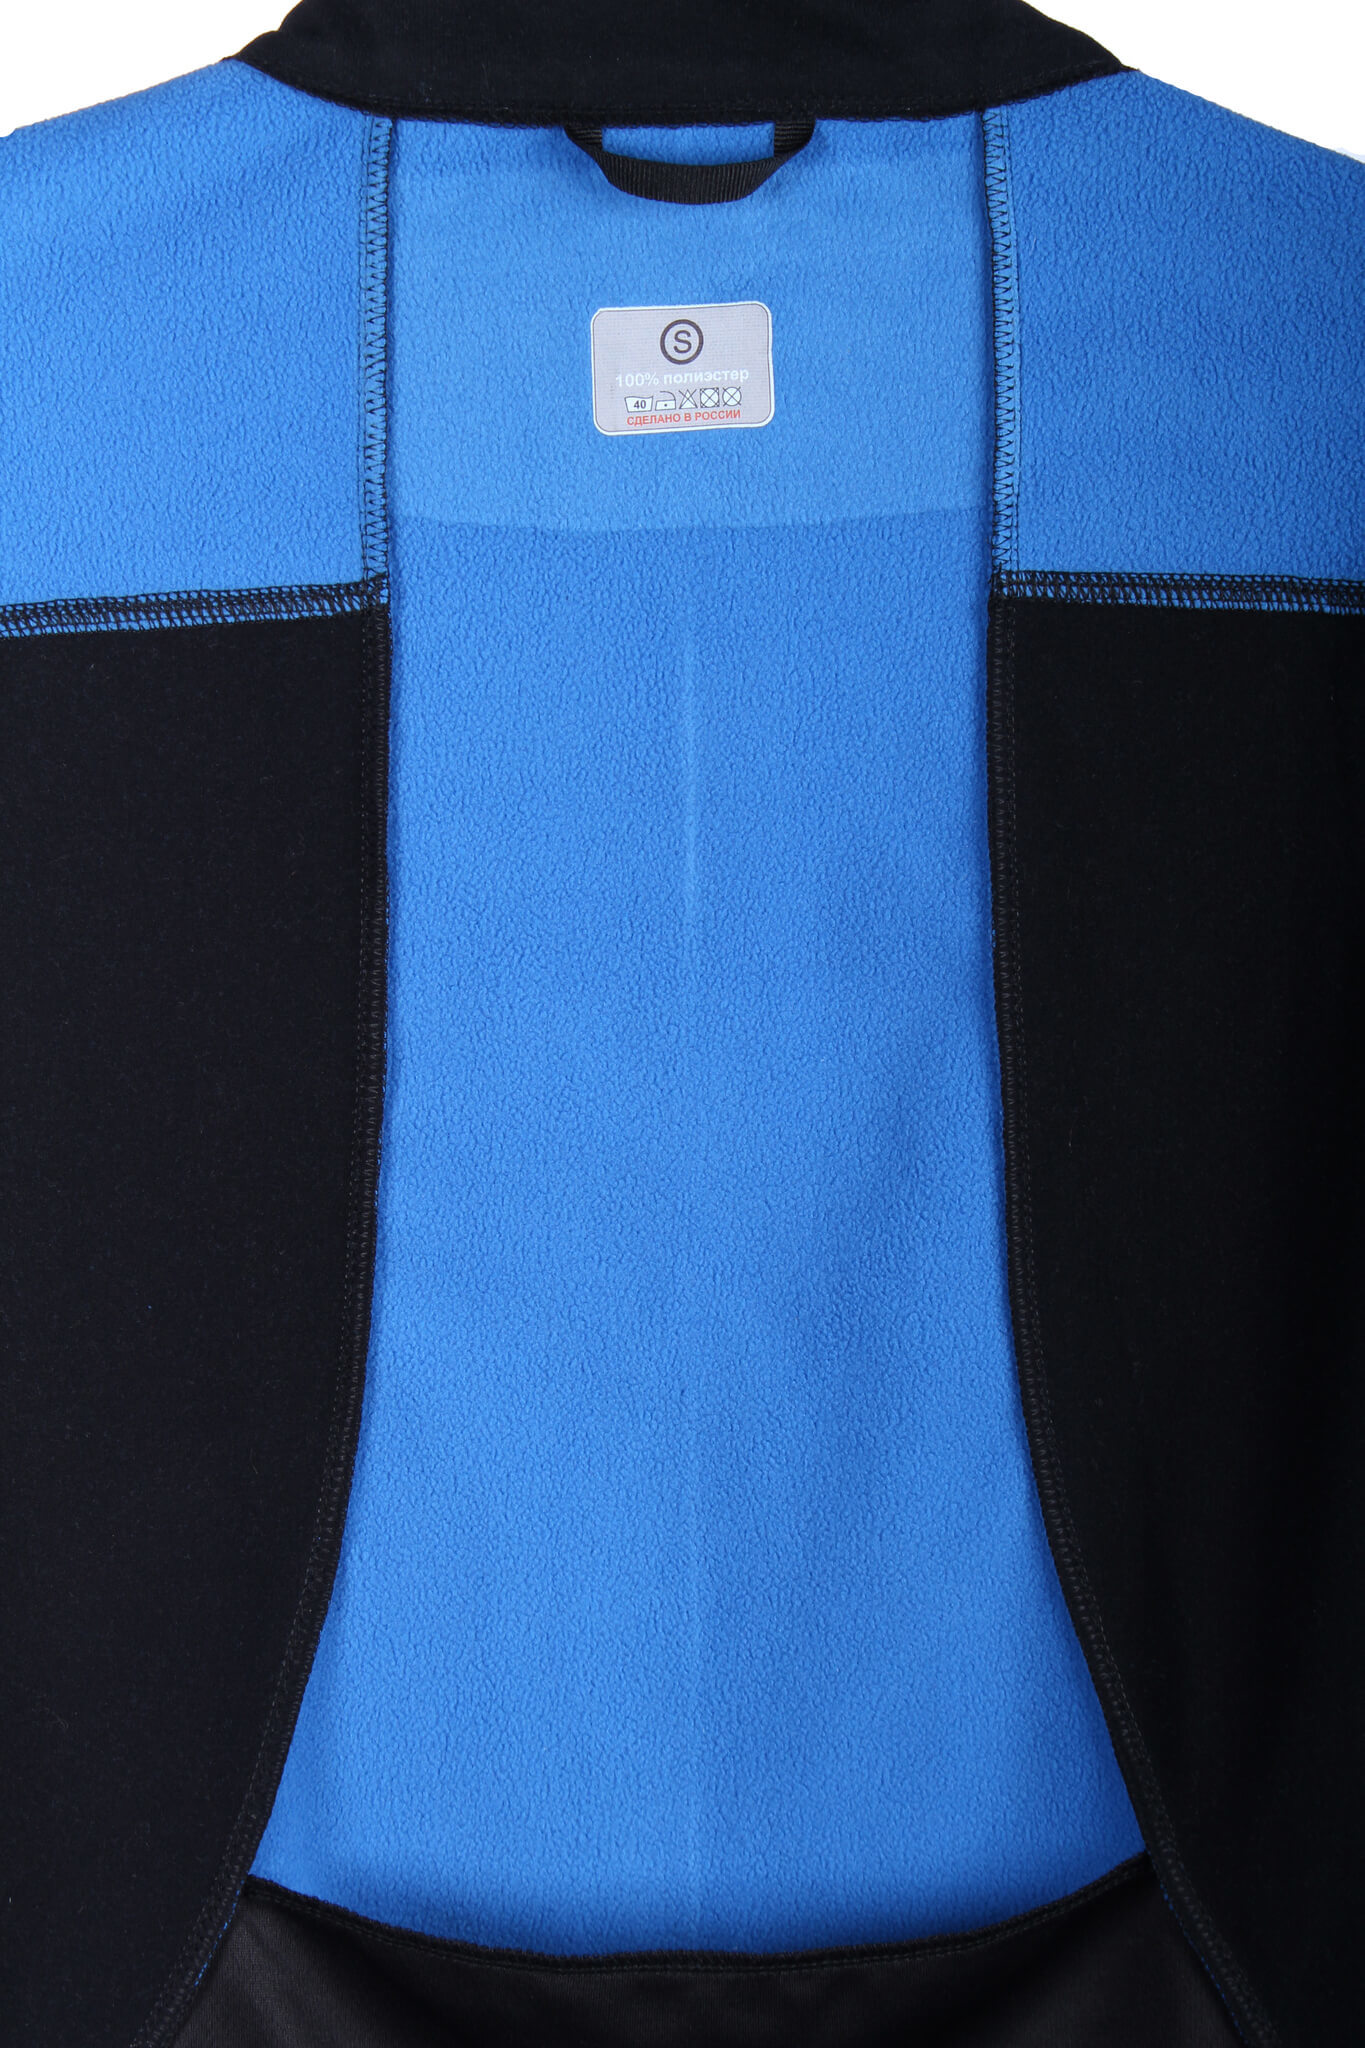 Утеплённый лыжный костюм Storm Speed (Шторм) blue мужской - 3